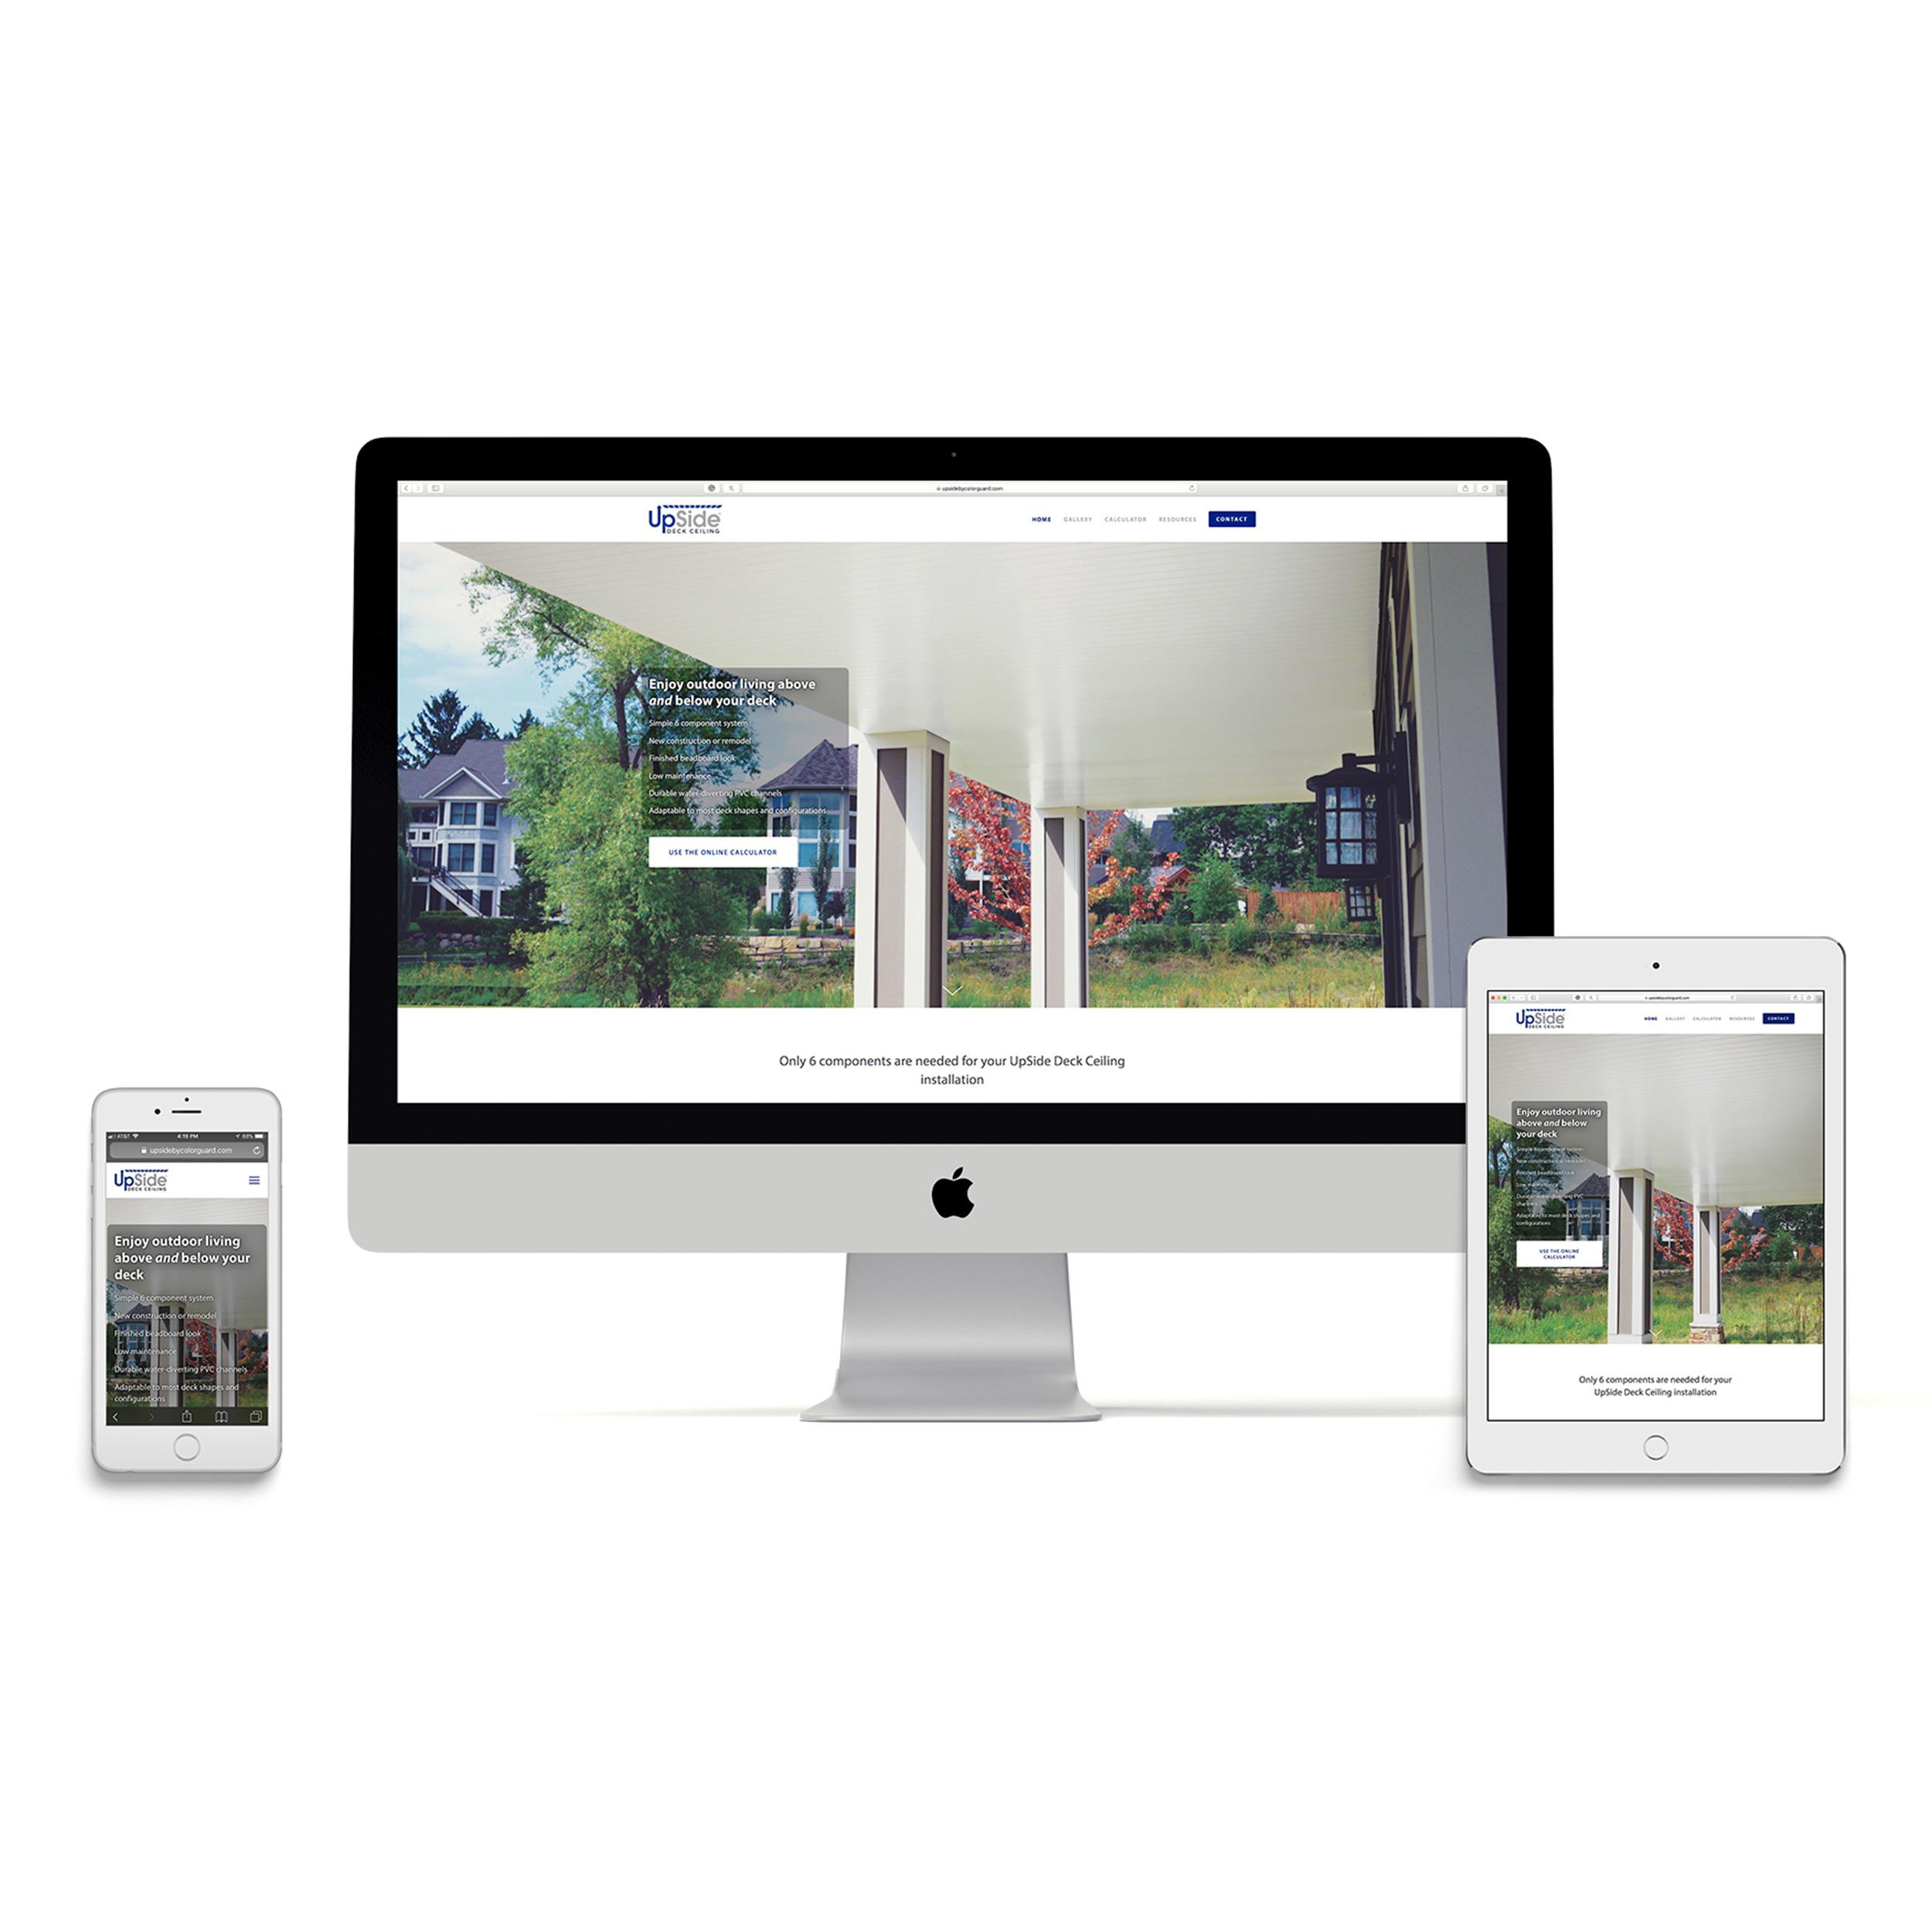 upside_website_home.jpg